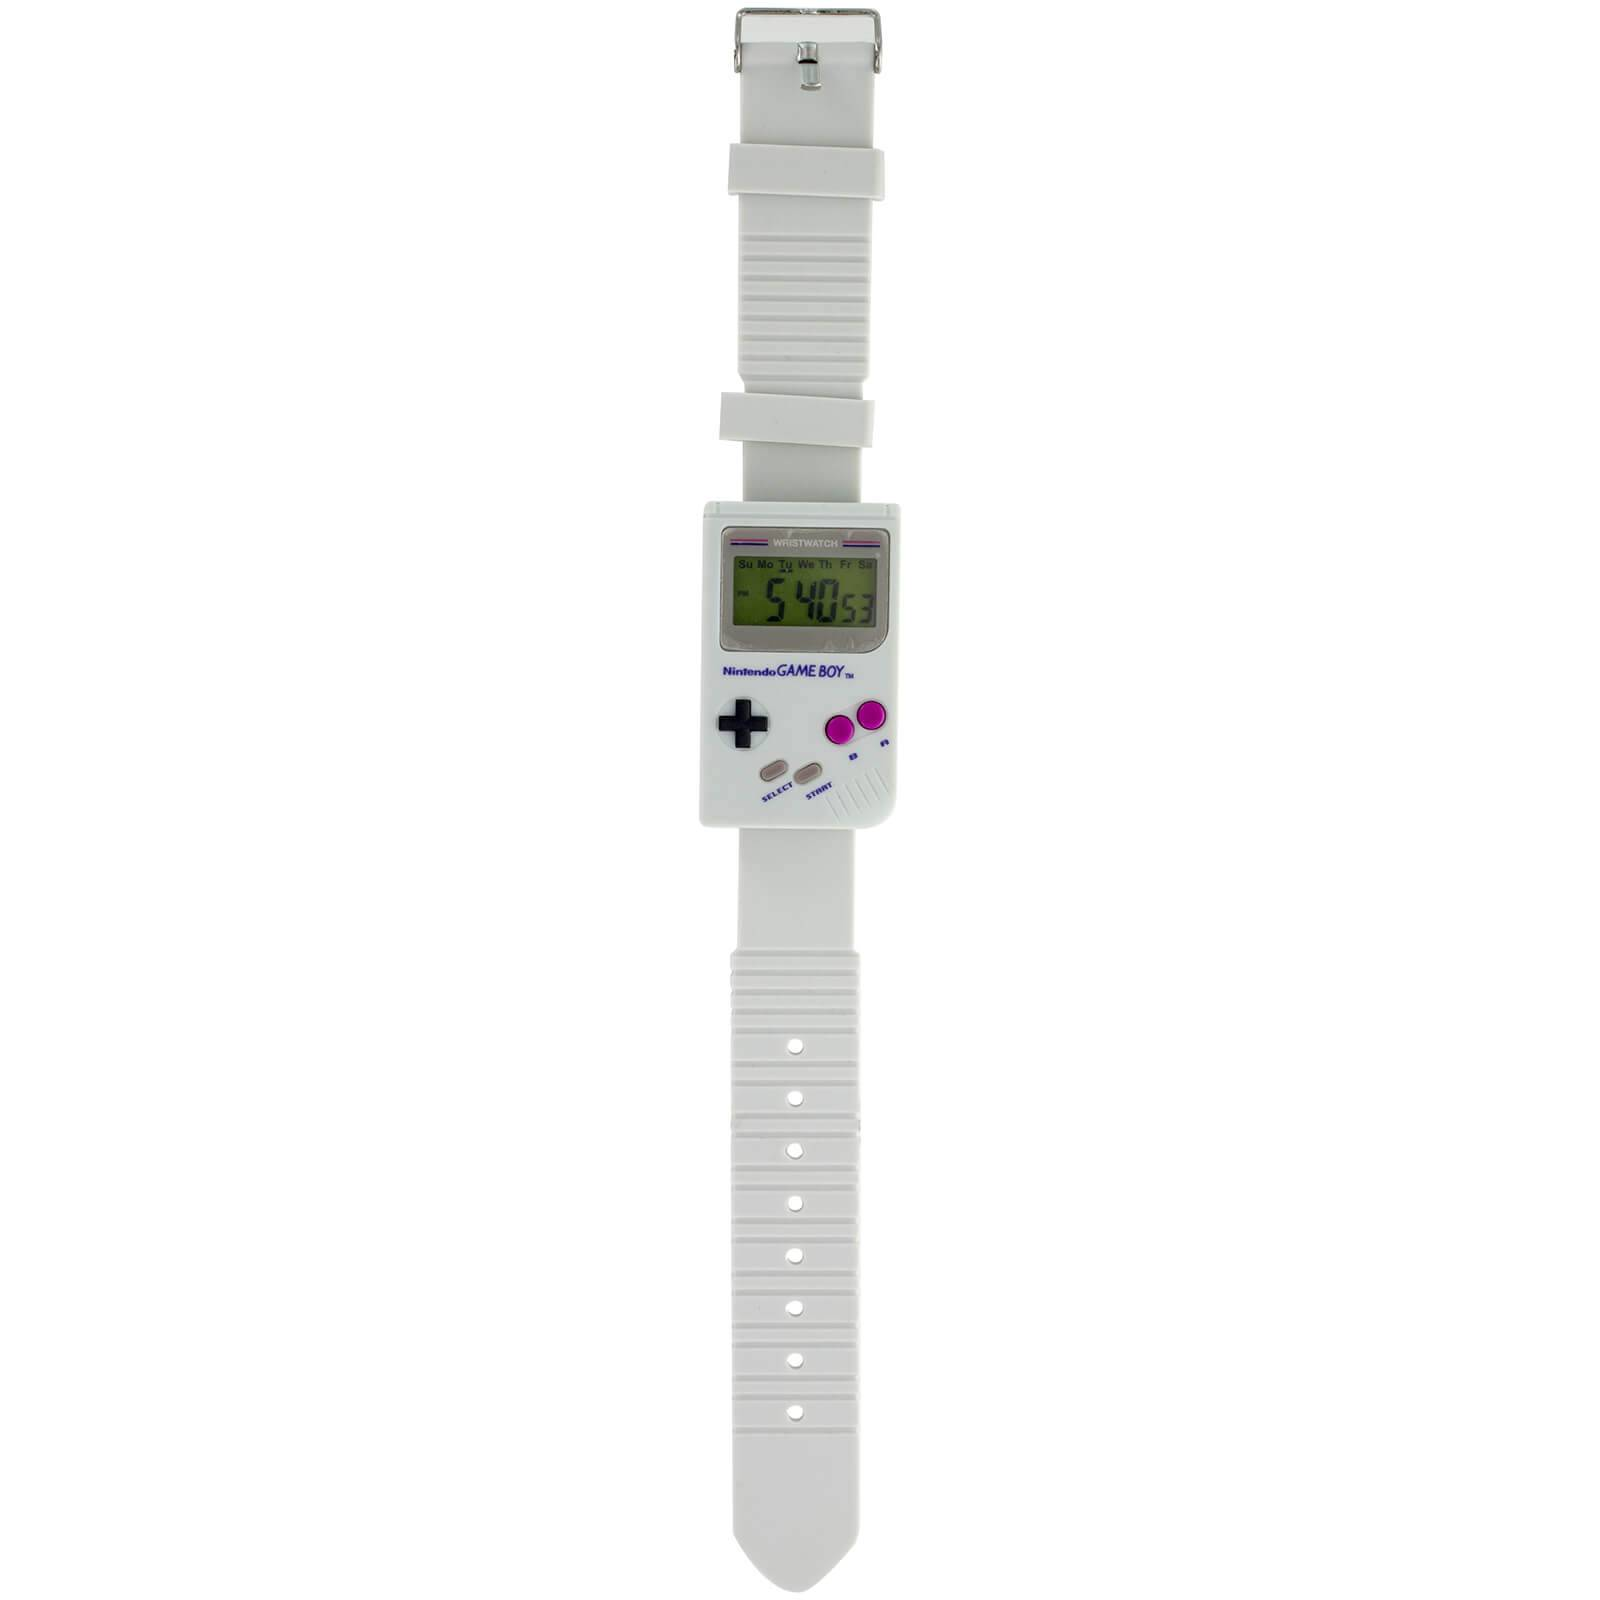 Paladone Nintendo Game Boy Watch